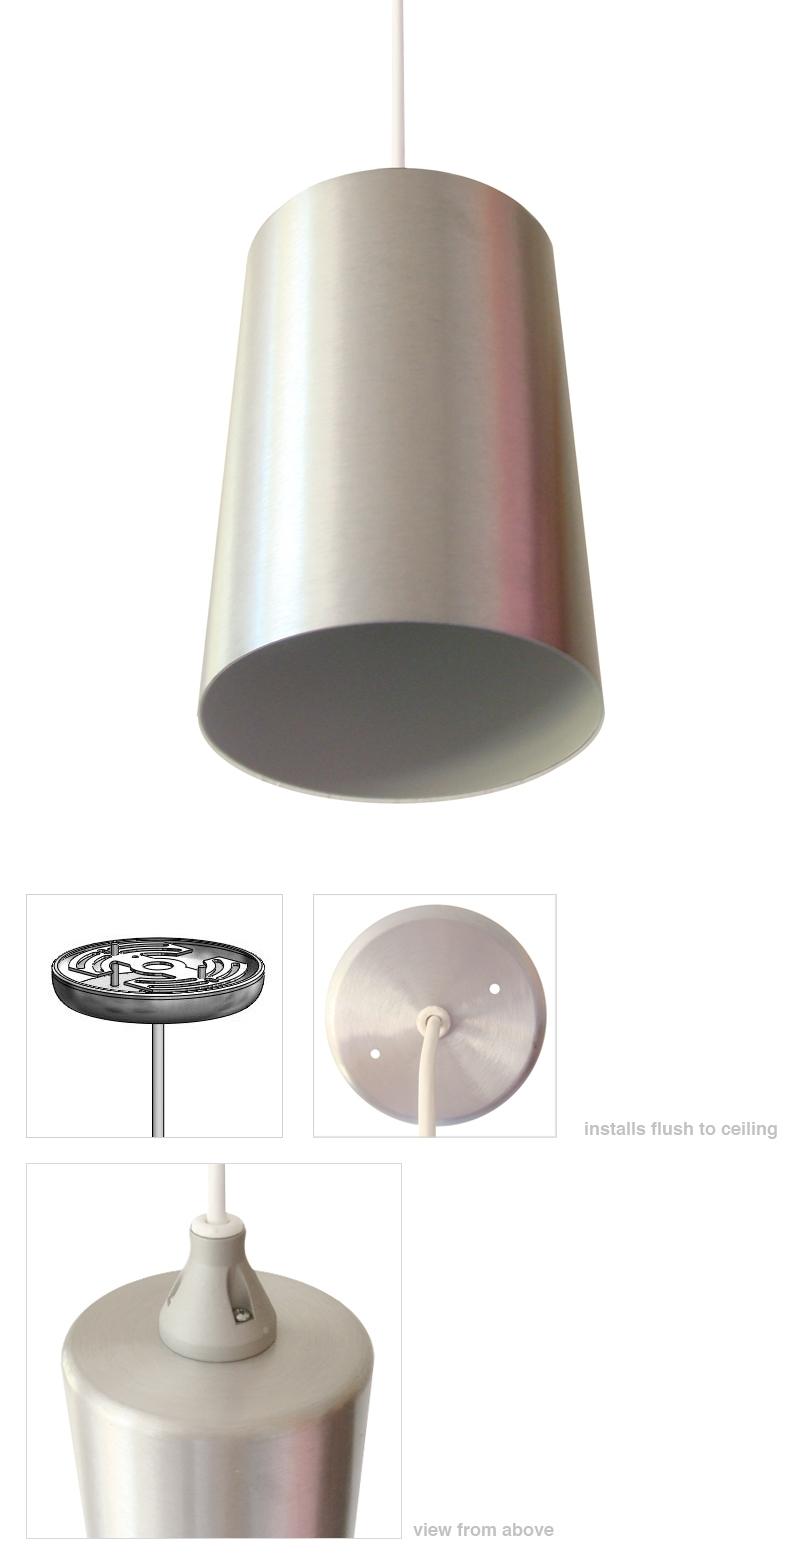 Contemporary Pendant Lighting For Kitchen Pendulum Lighting Over Regarding Modern Outdoor Pendant Cylinder Lighting Fixtures (#4 of 15)